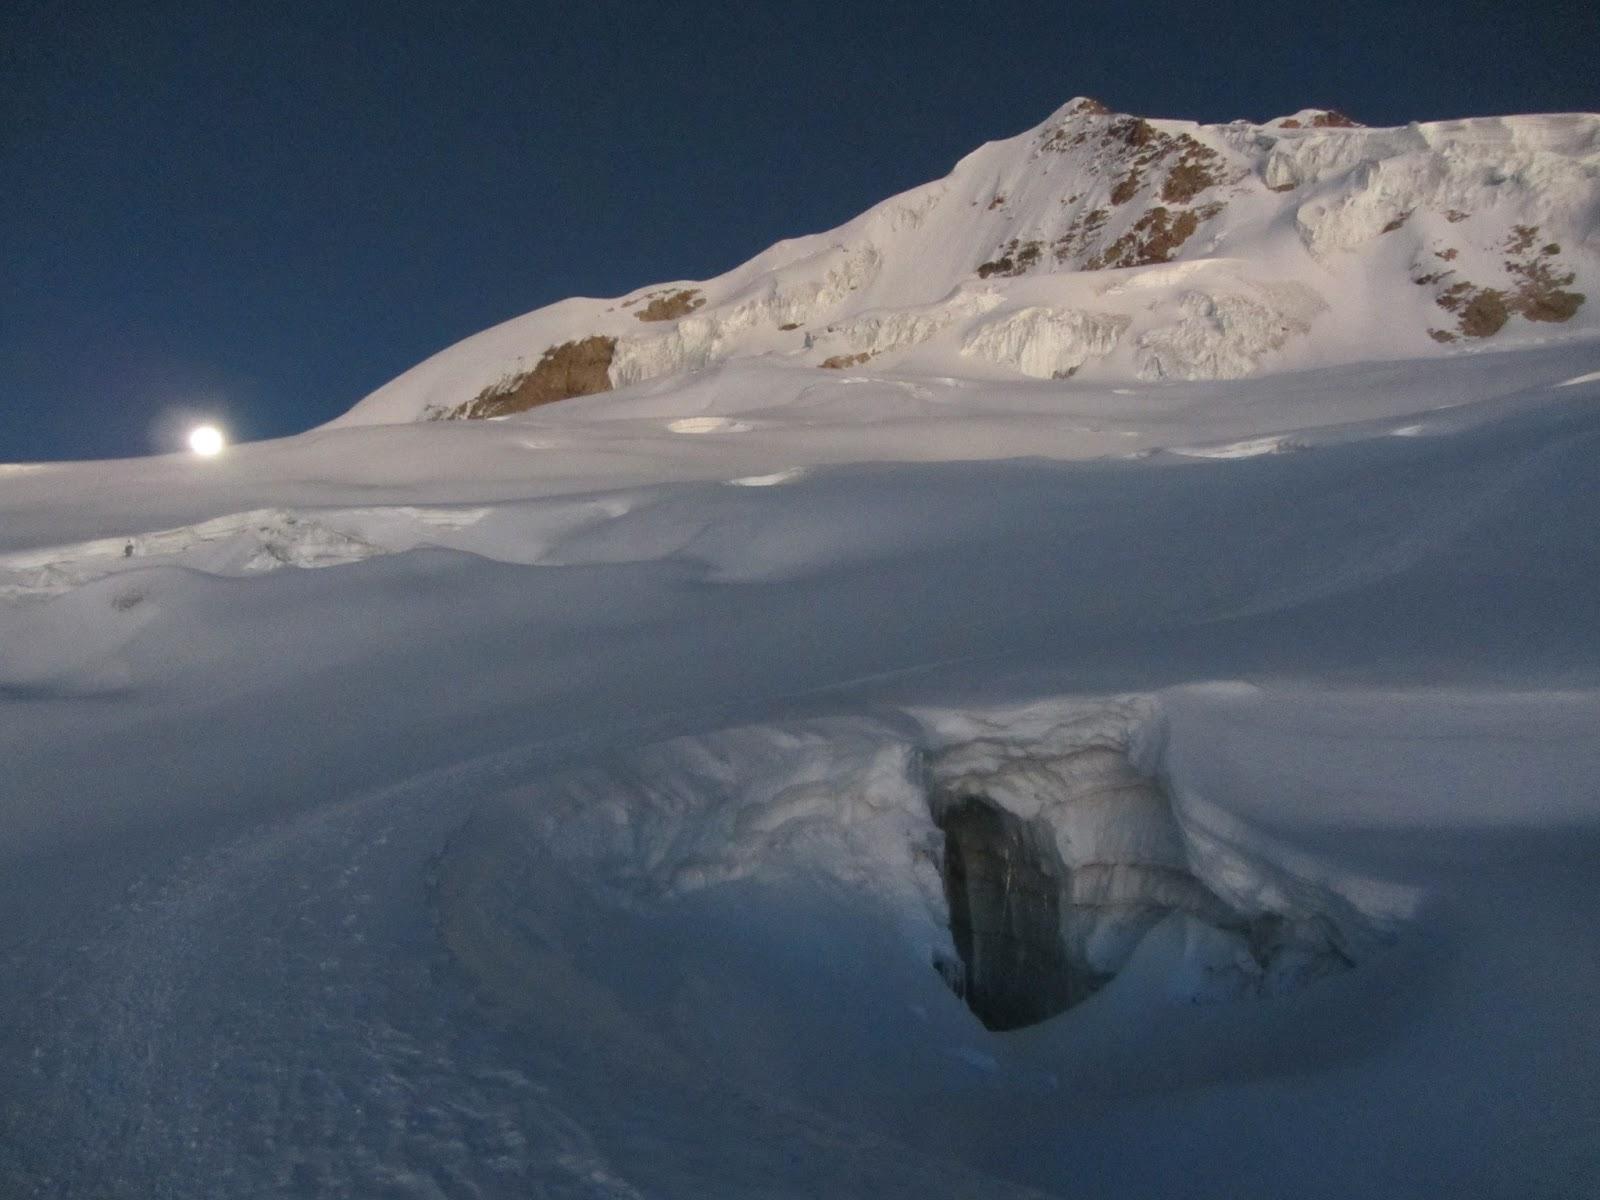 Mount Huayna Potosi